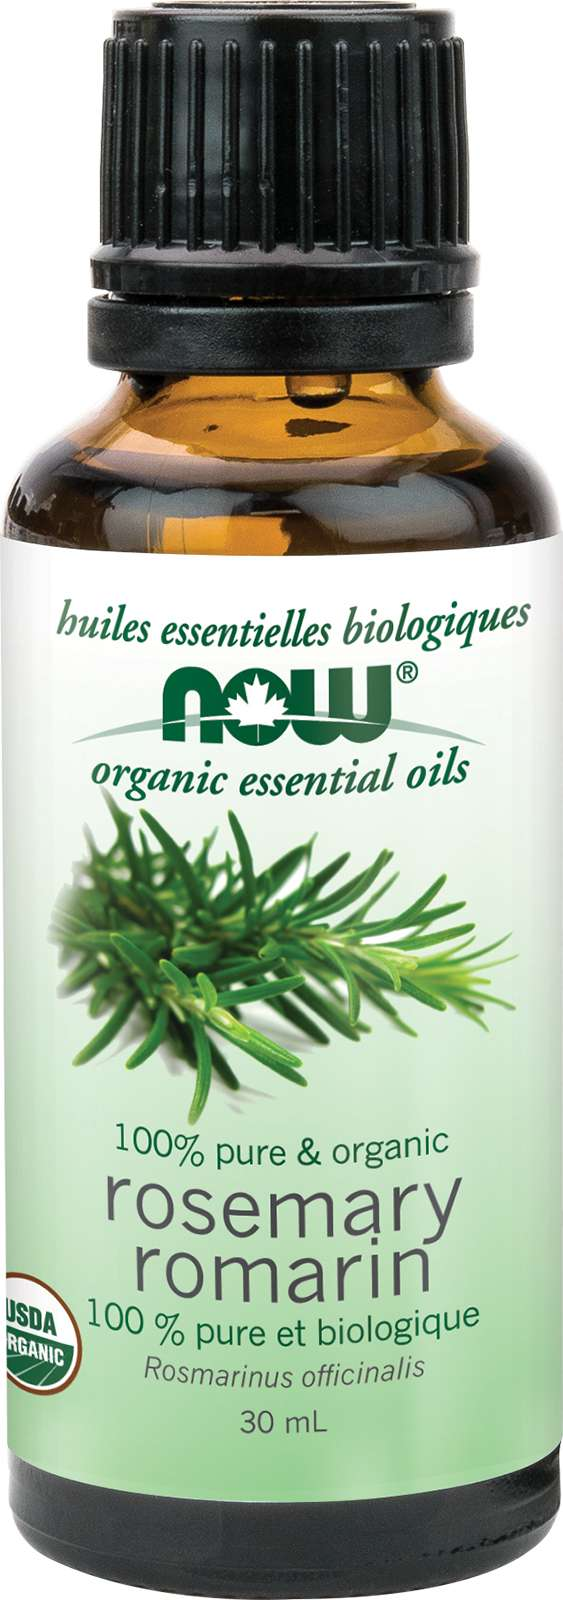 Organic Rosemary Oil (Rosmarinus officinalis) 30mL